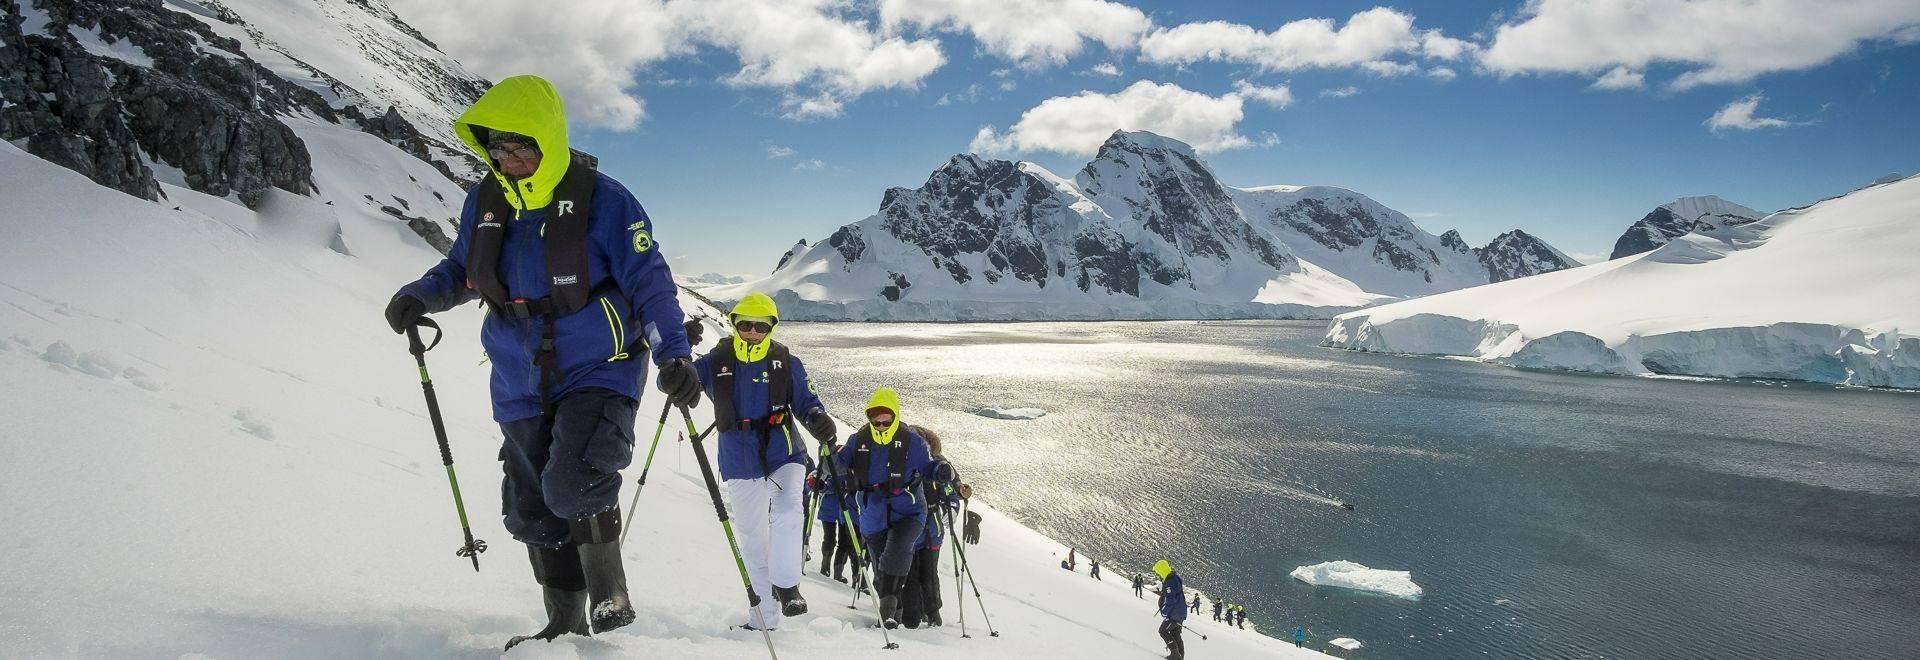 Hiking Orne Harbor In Antarctica HGR 112390